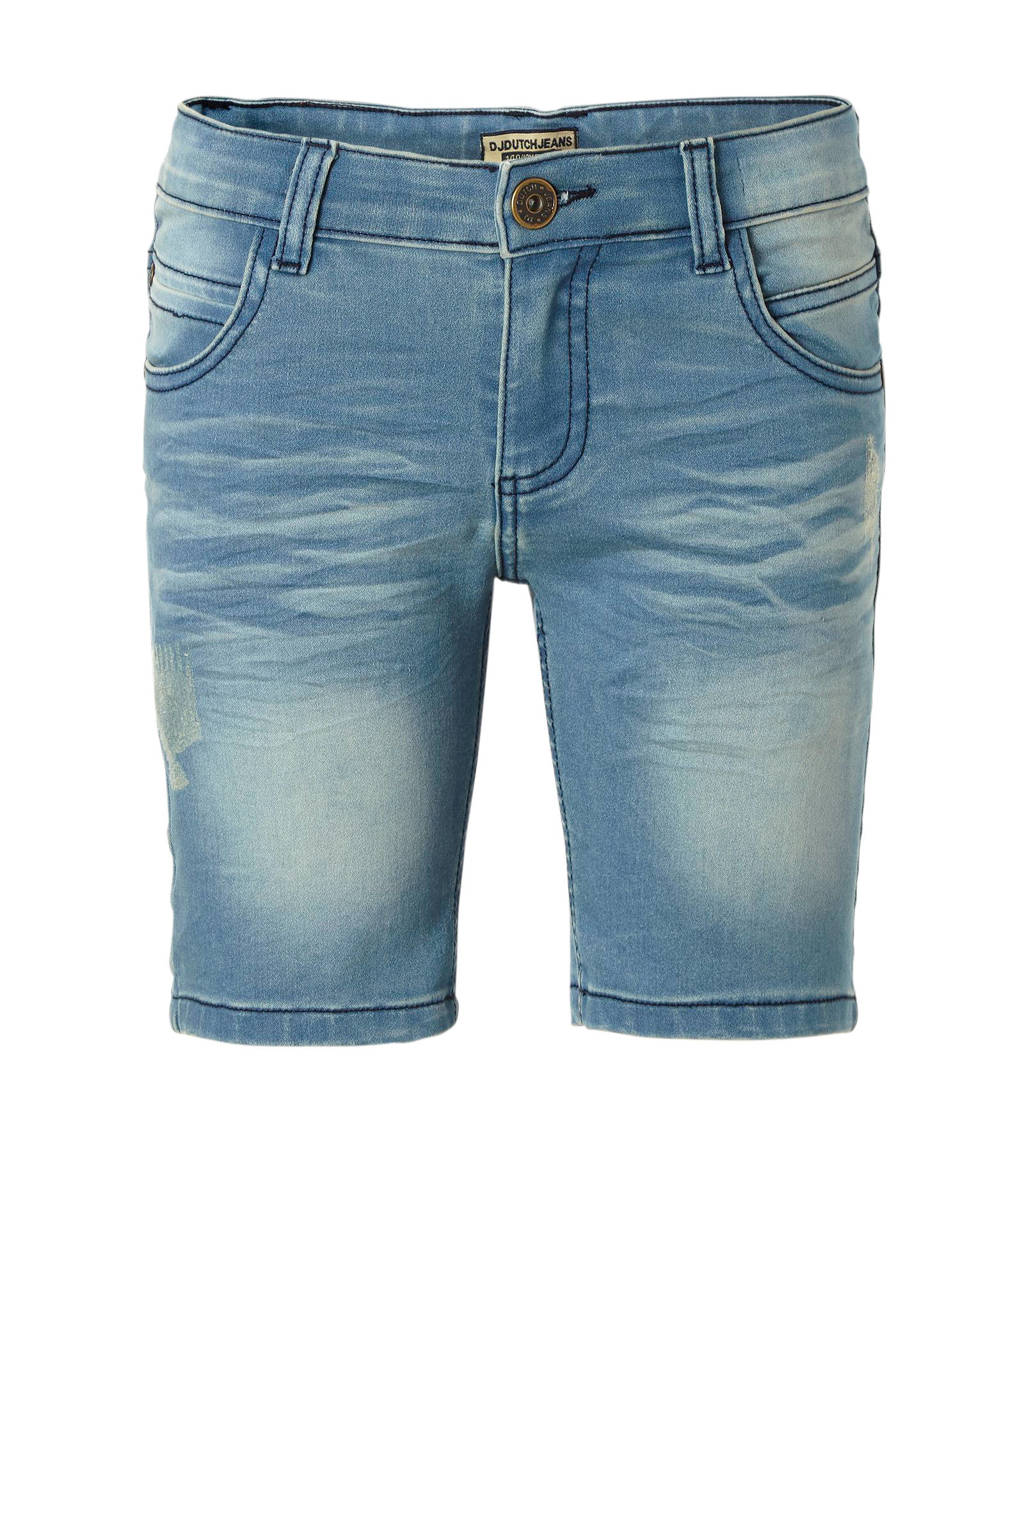 DJ Dutchjeans jeans bermuda, Blauw